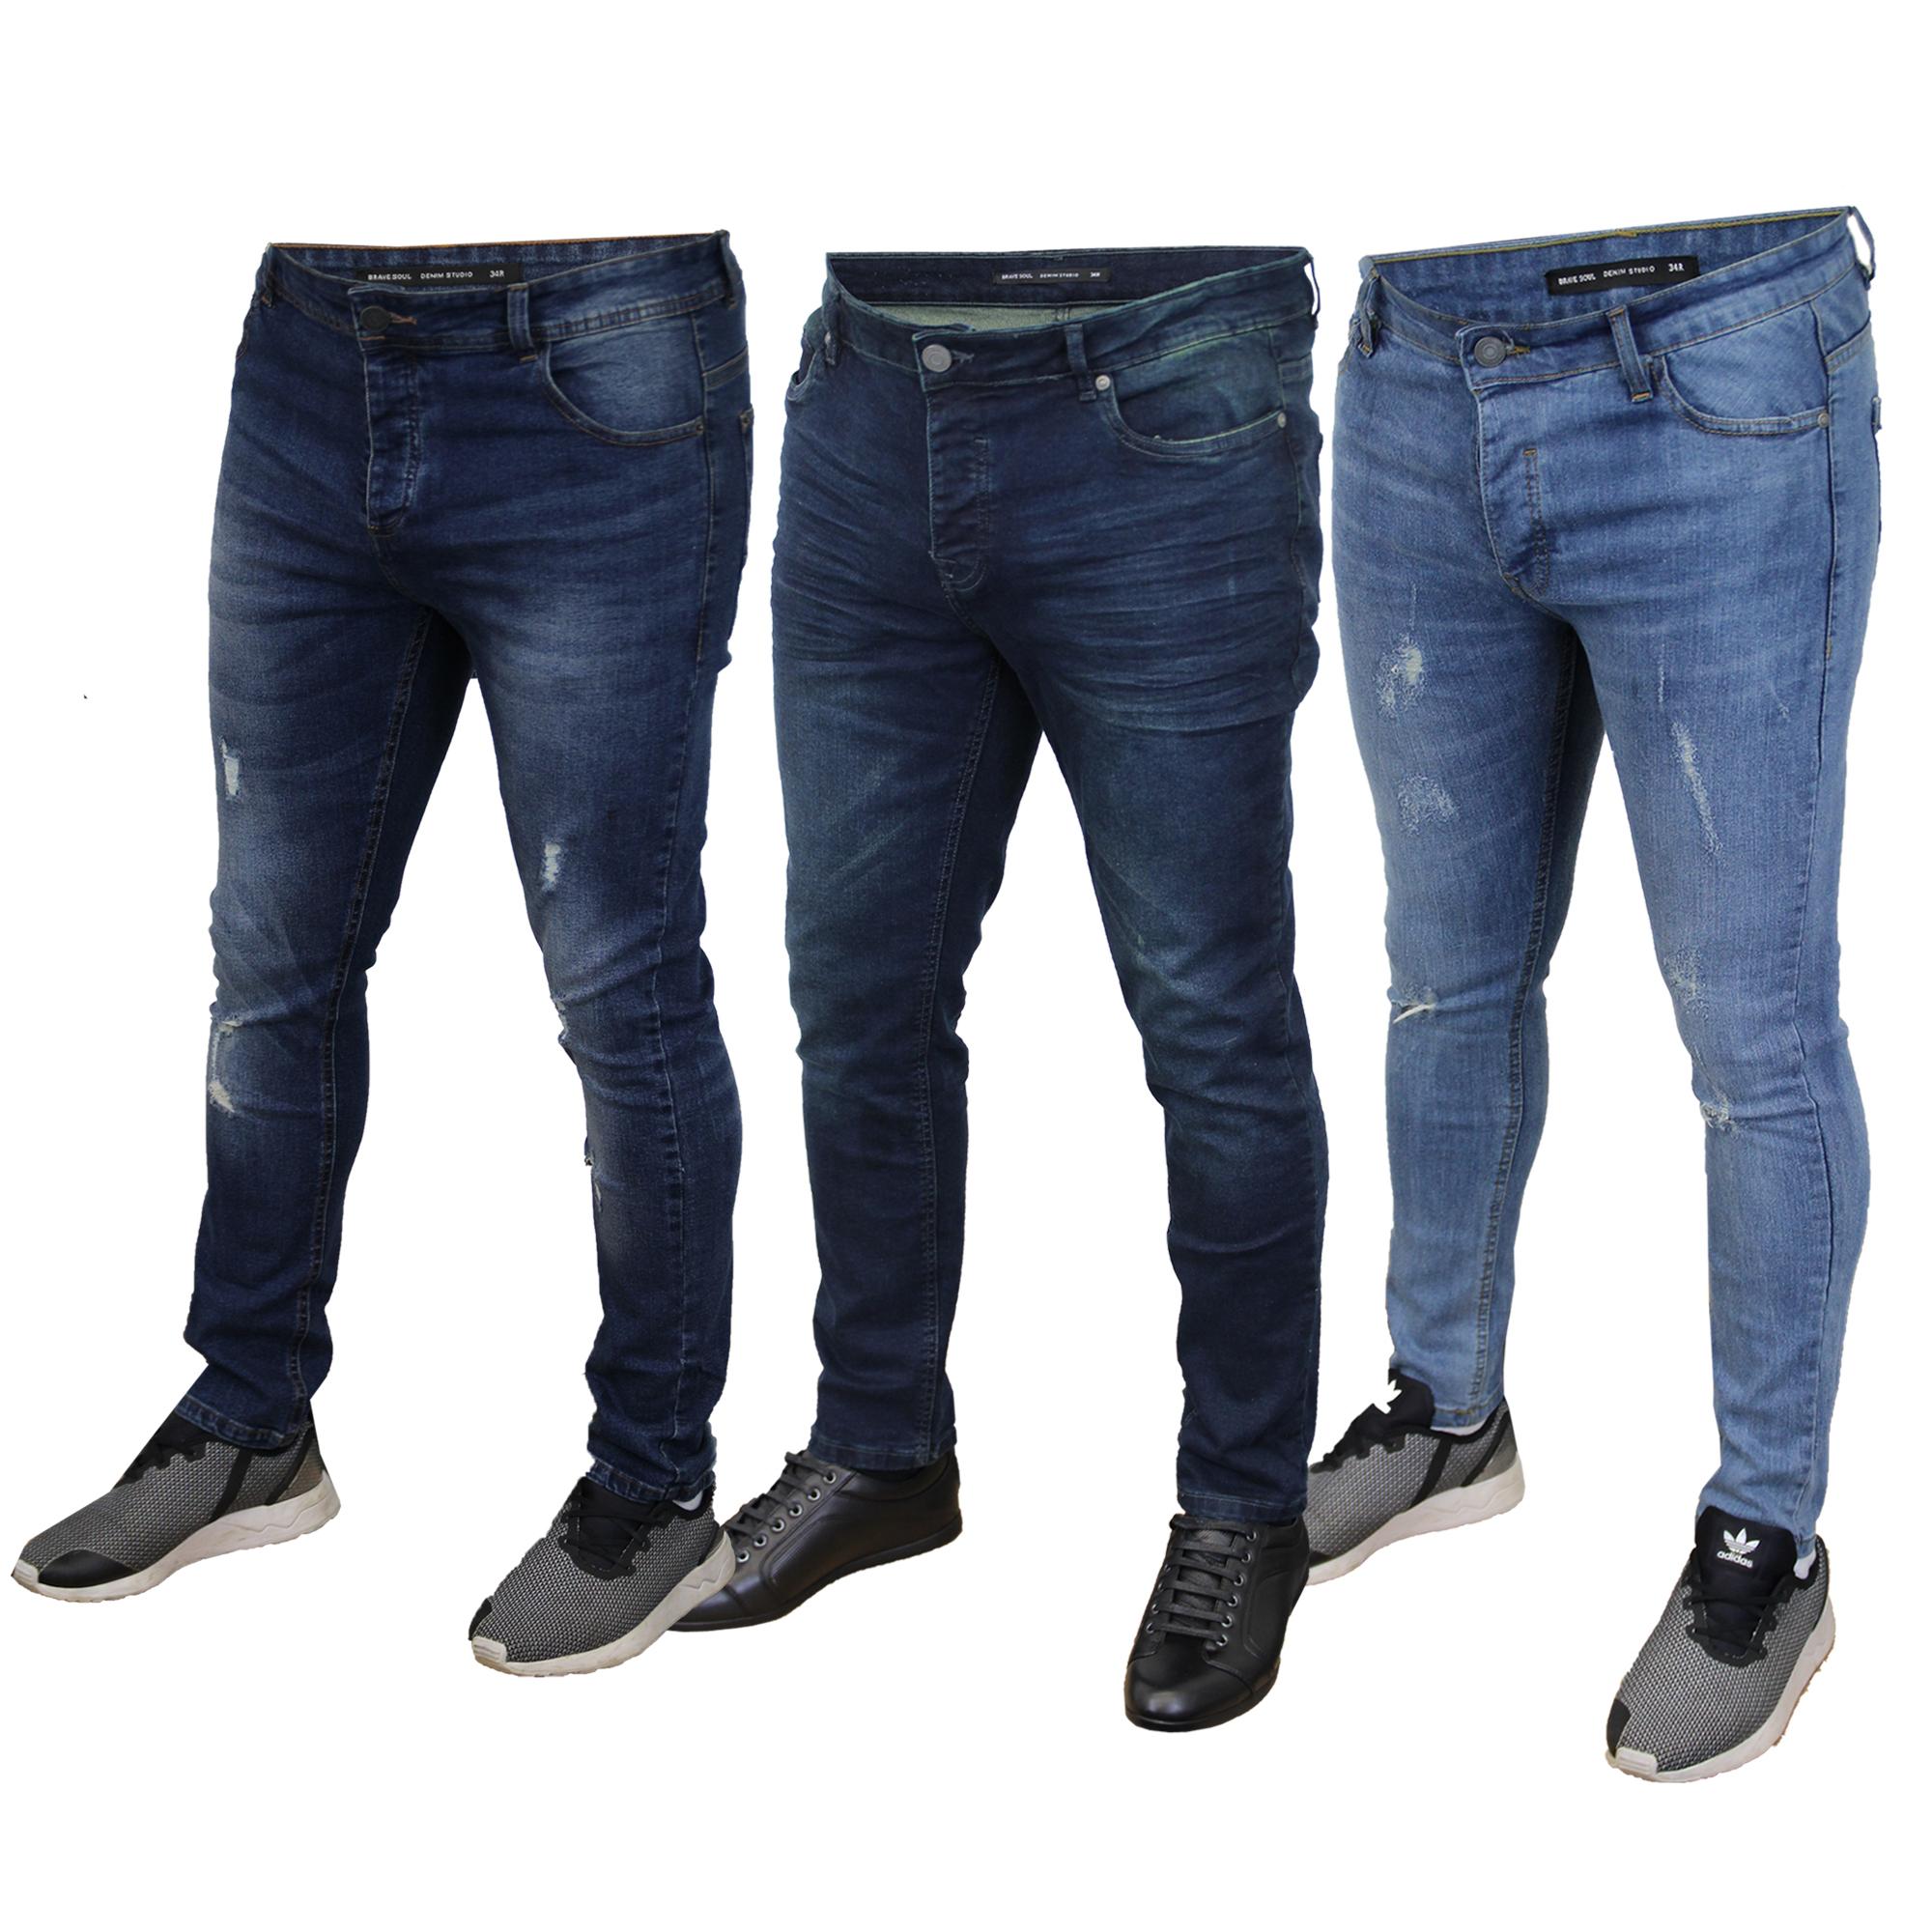 890240e9cd9 Mens Ripped Denim Jeans Brave Soul Ortiz Slim Fit Lark Stretch ...